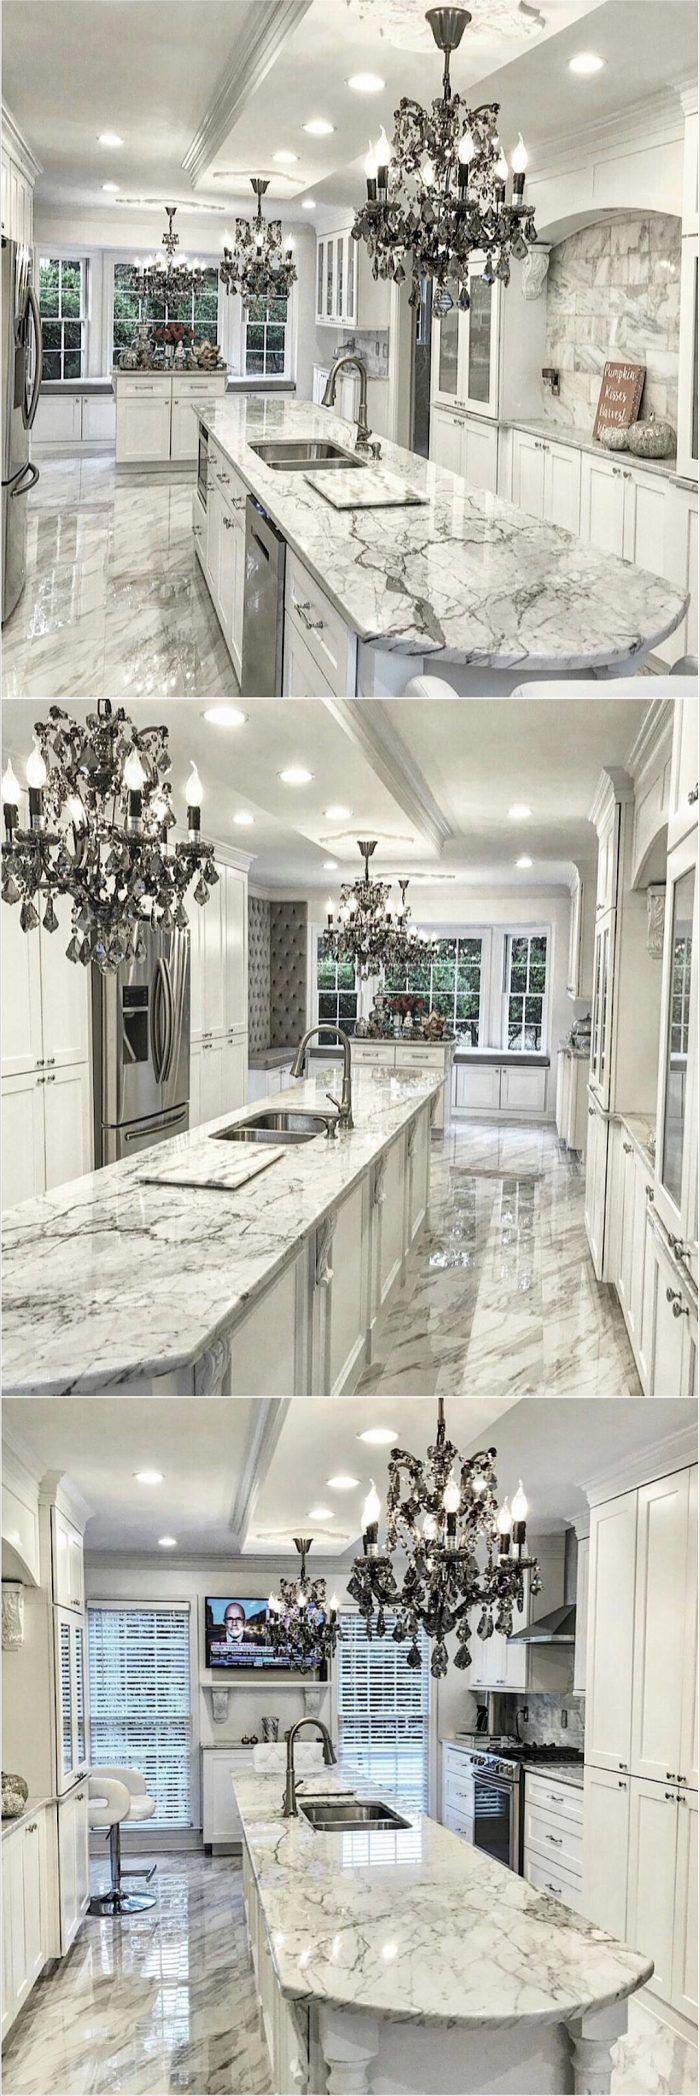 Gorgeous Glamorous Kitchen Design Glam Style Living